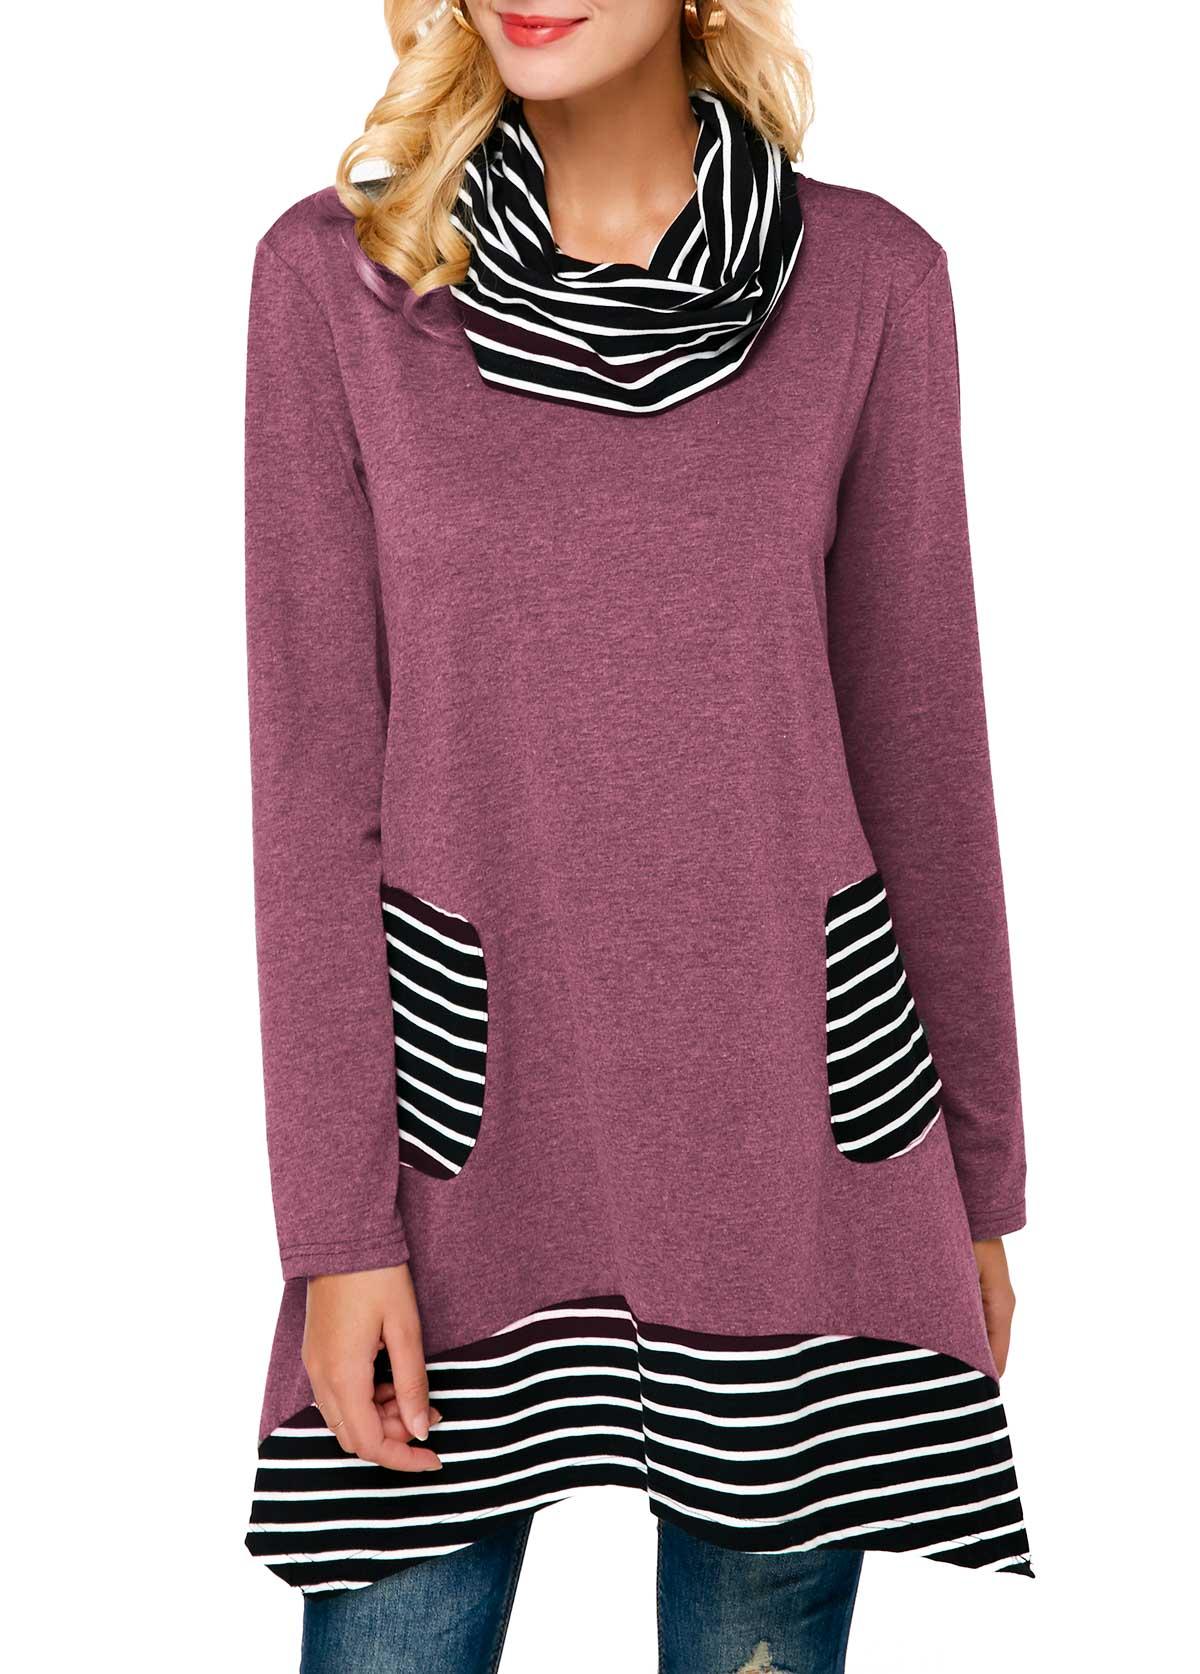 Striped Long Sleeve Cowl Neck Sweatshirt